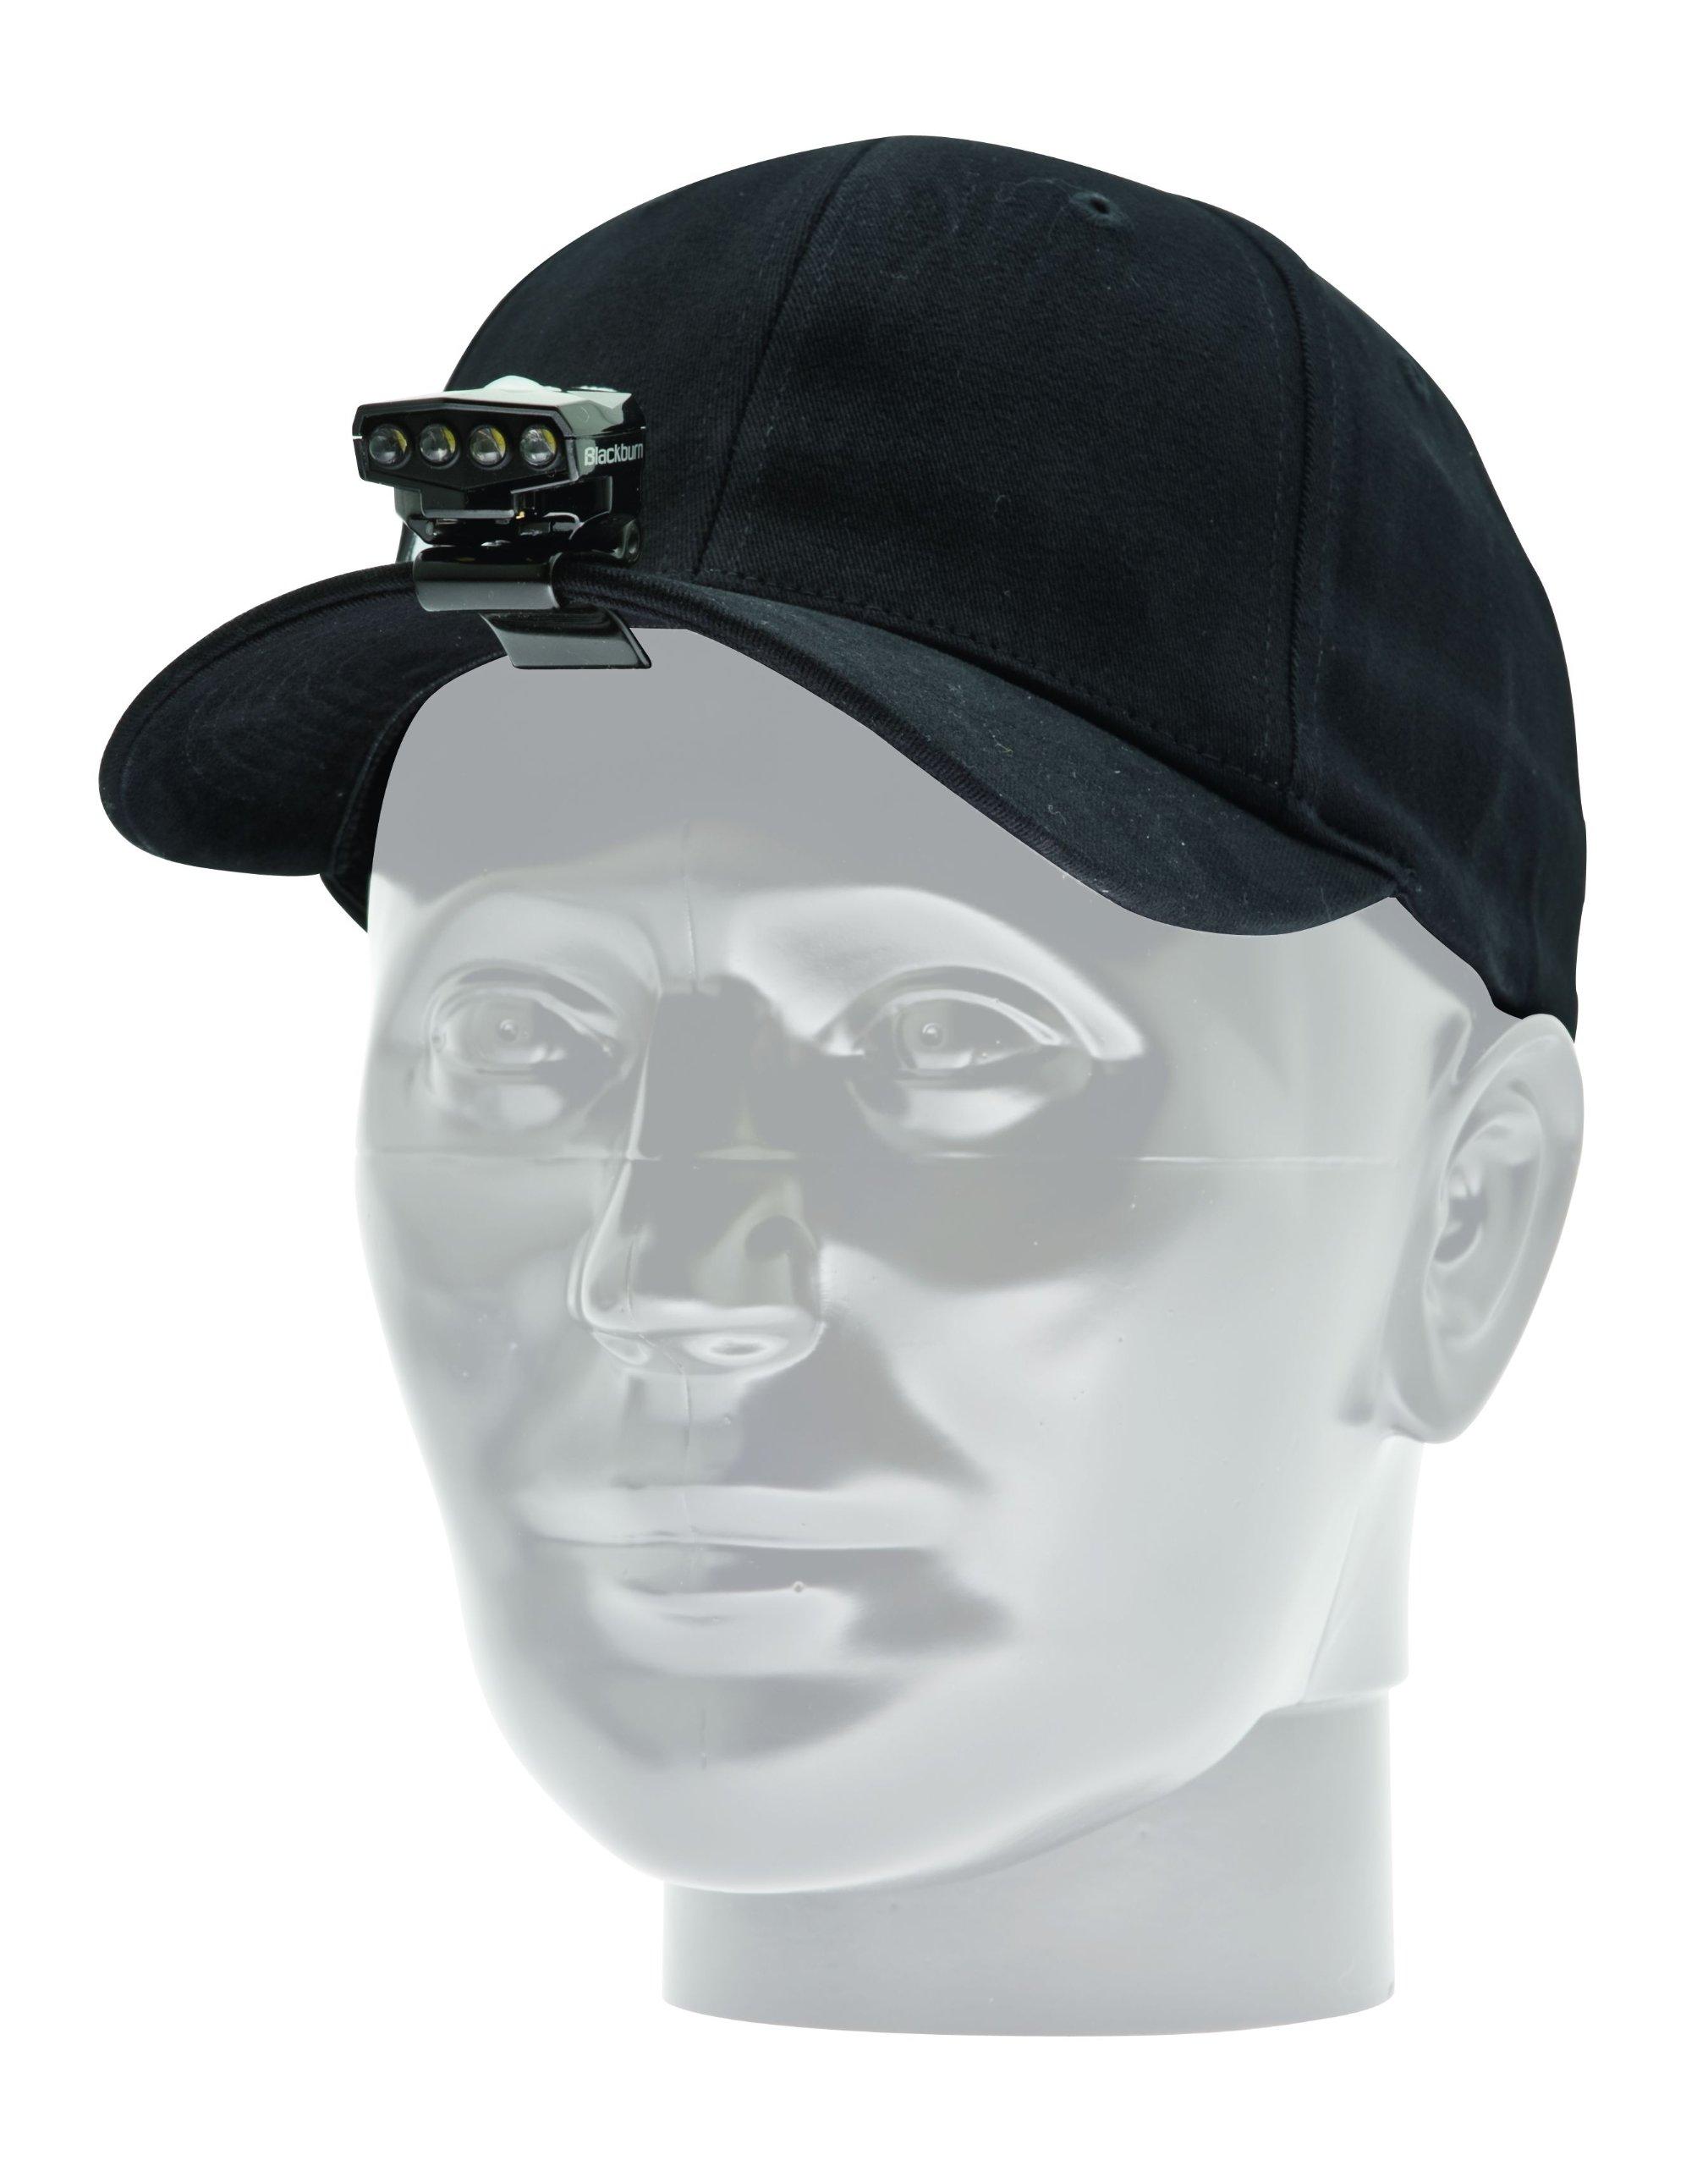 Blackburn Helmet / Head / Hat Mount Kit for Flea Headlight